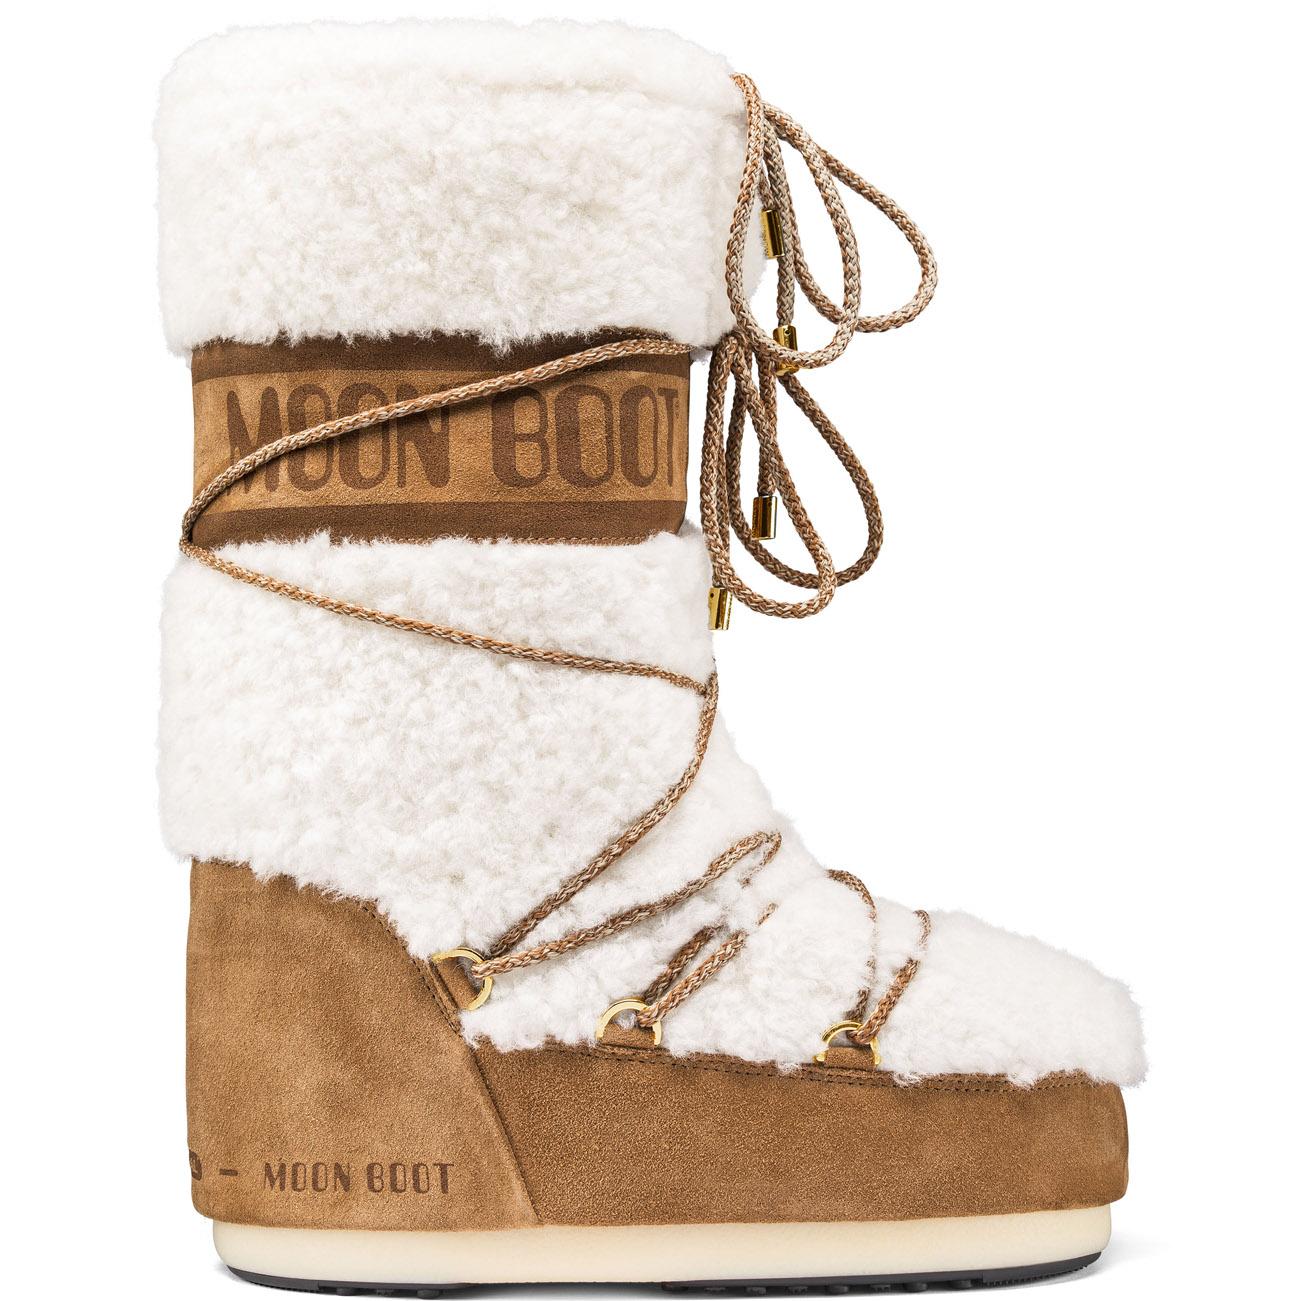 Unisex Adults Tecnica Moon Boot Classic Premium Wool